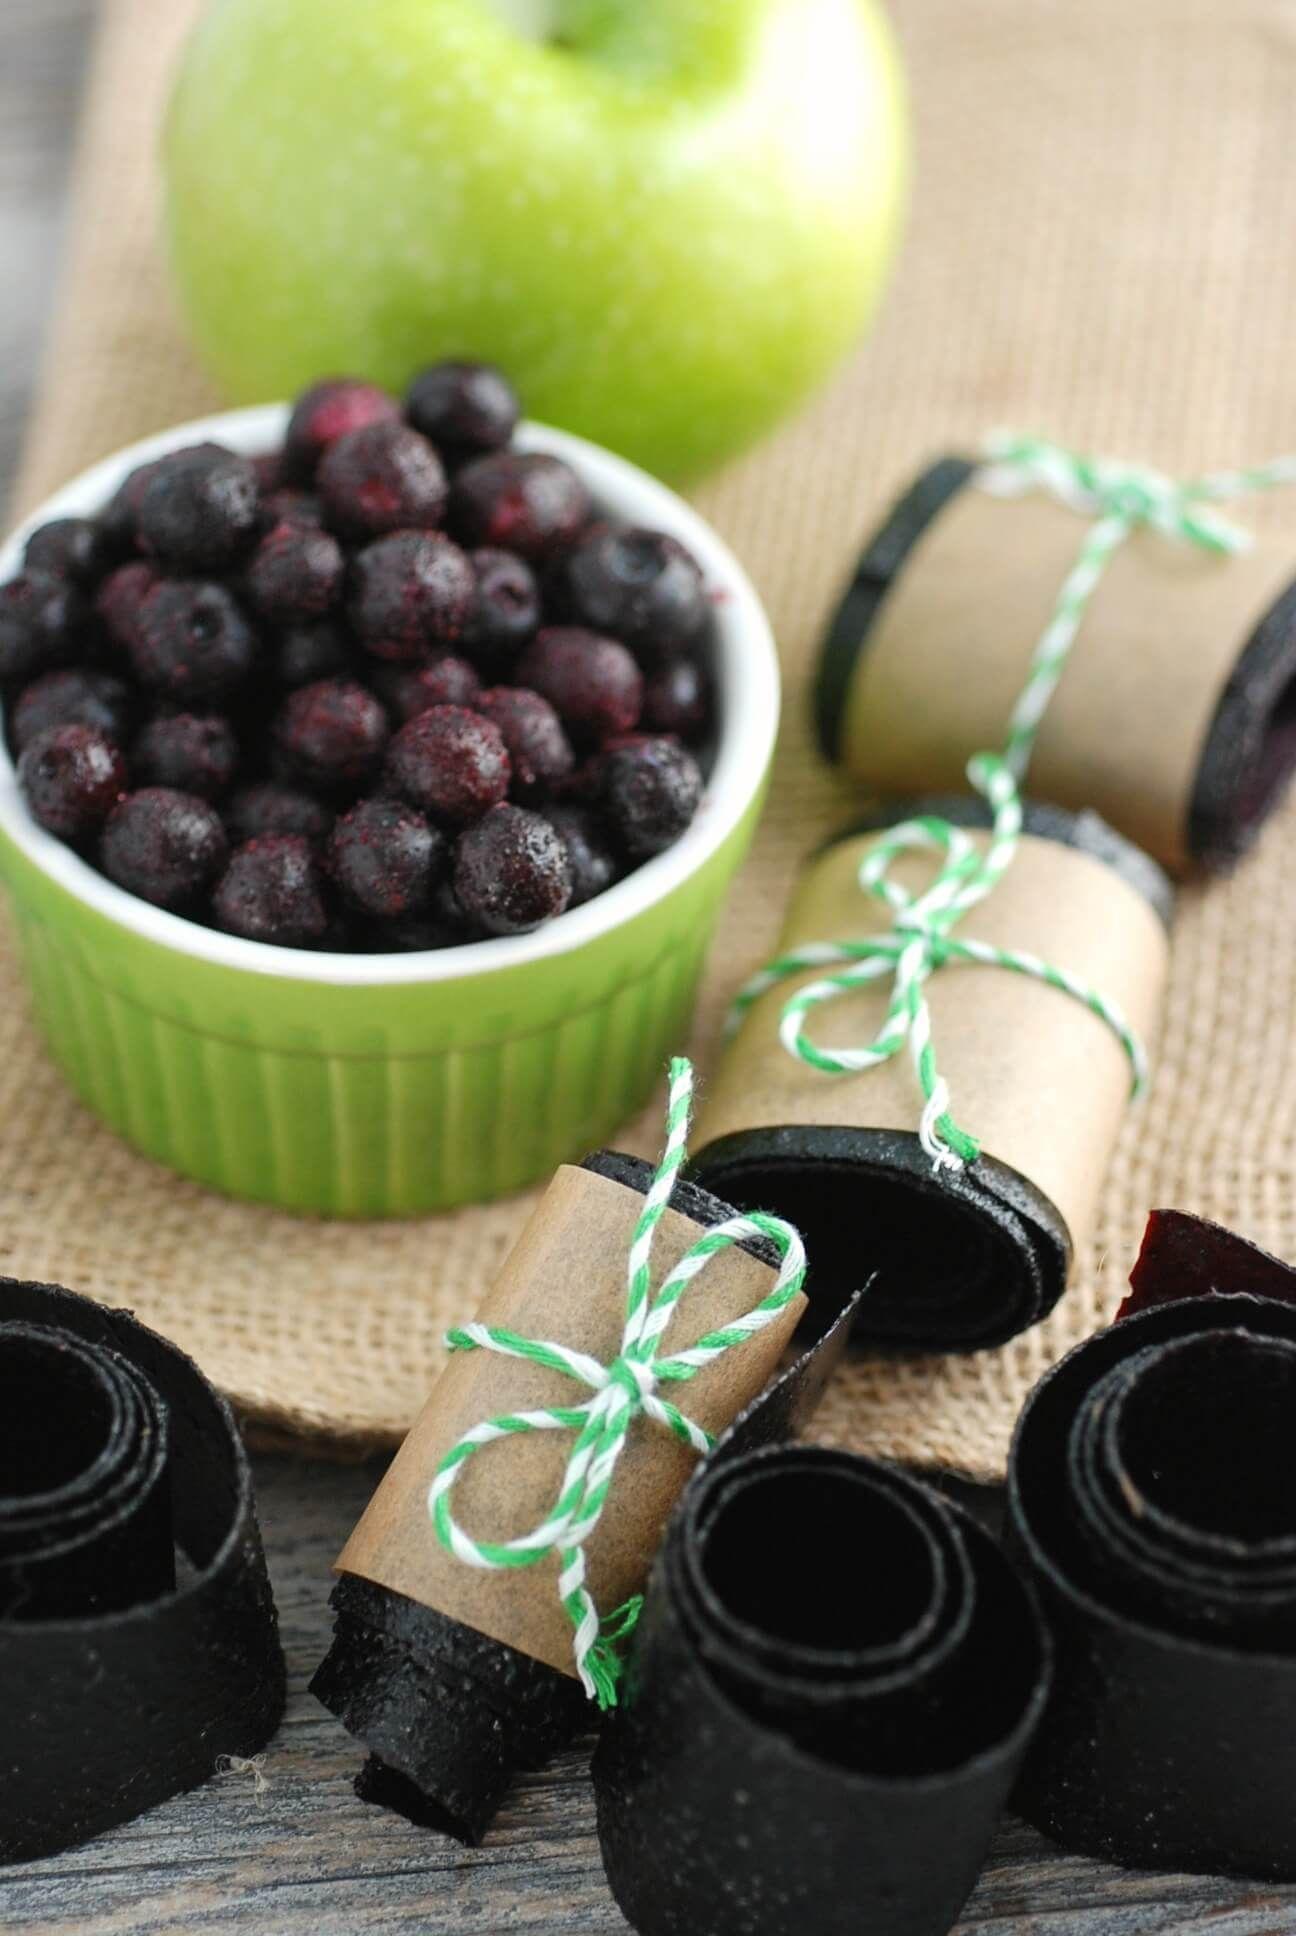 Easy Homemade Nutrition Packed Wild Blueberry Fruit